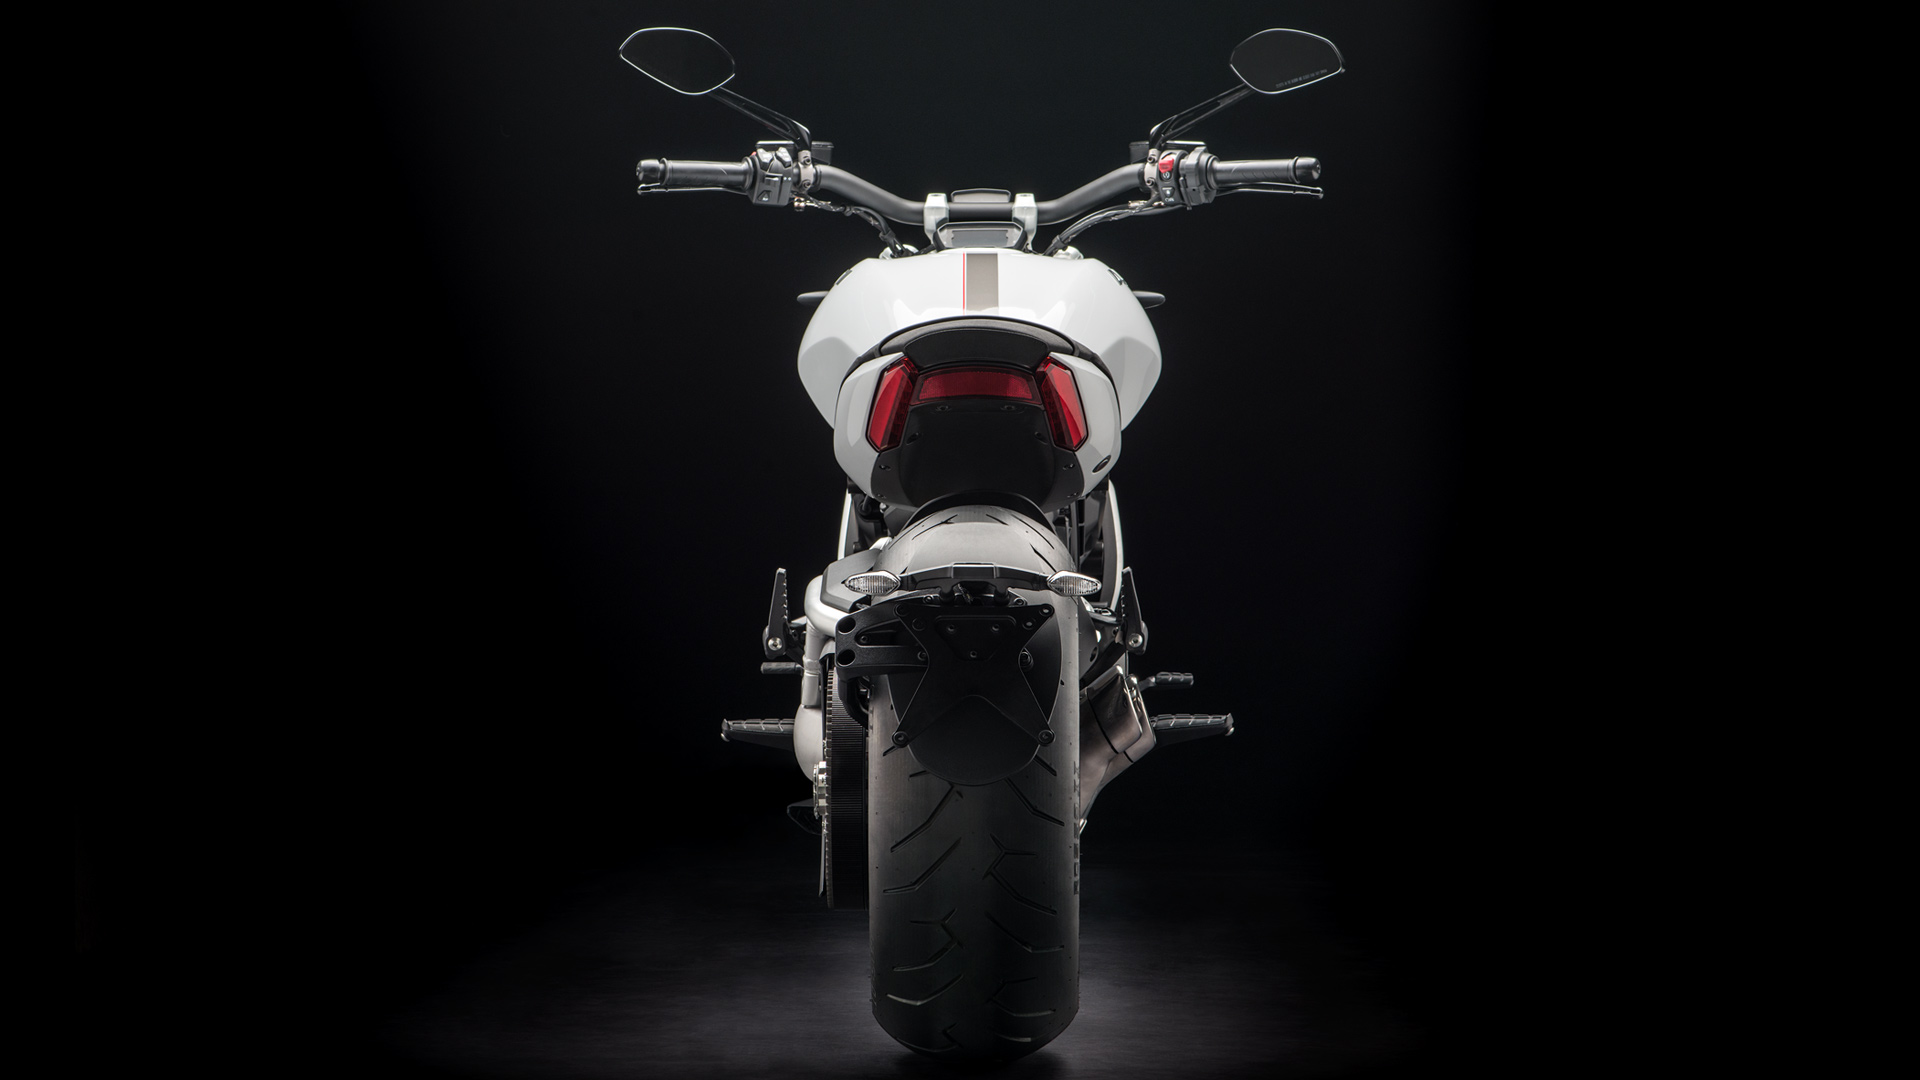 МОТОЦИКЛ DUCATI DIAVEL S ICEBERG  Артмото - купить квадроцикл в украине и харькове, мотоцикл, снегоход, скутер, мопед, электромобиль